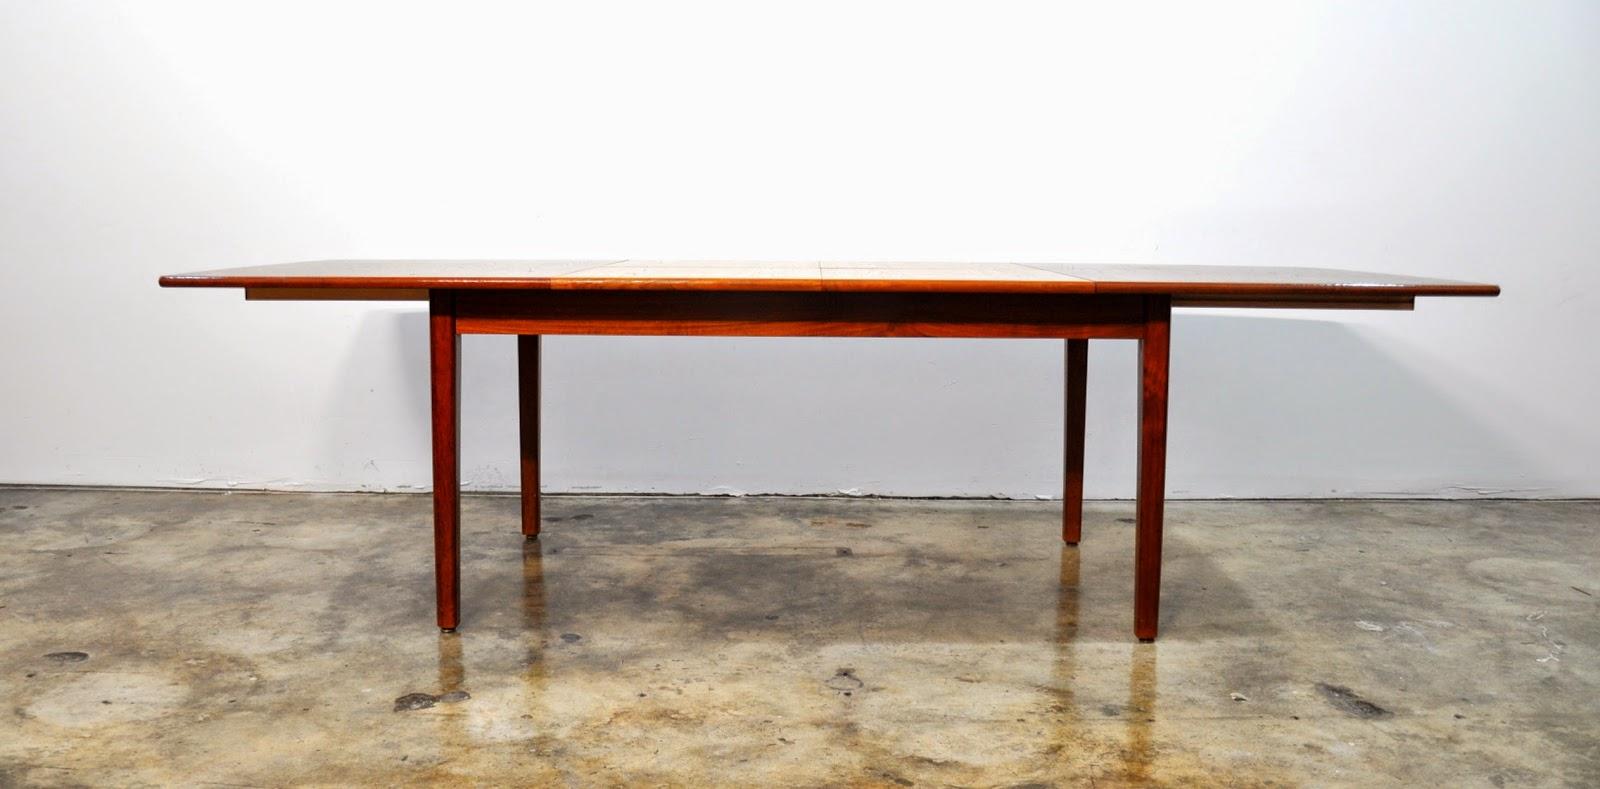 SELECT MODERN Falster Teak Expandable Dining Table : FalsterTeakDiningTable4 from midcenturymoderndesignfinds.blogspot.com size 1600 x 789 jpeg 145kB